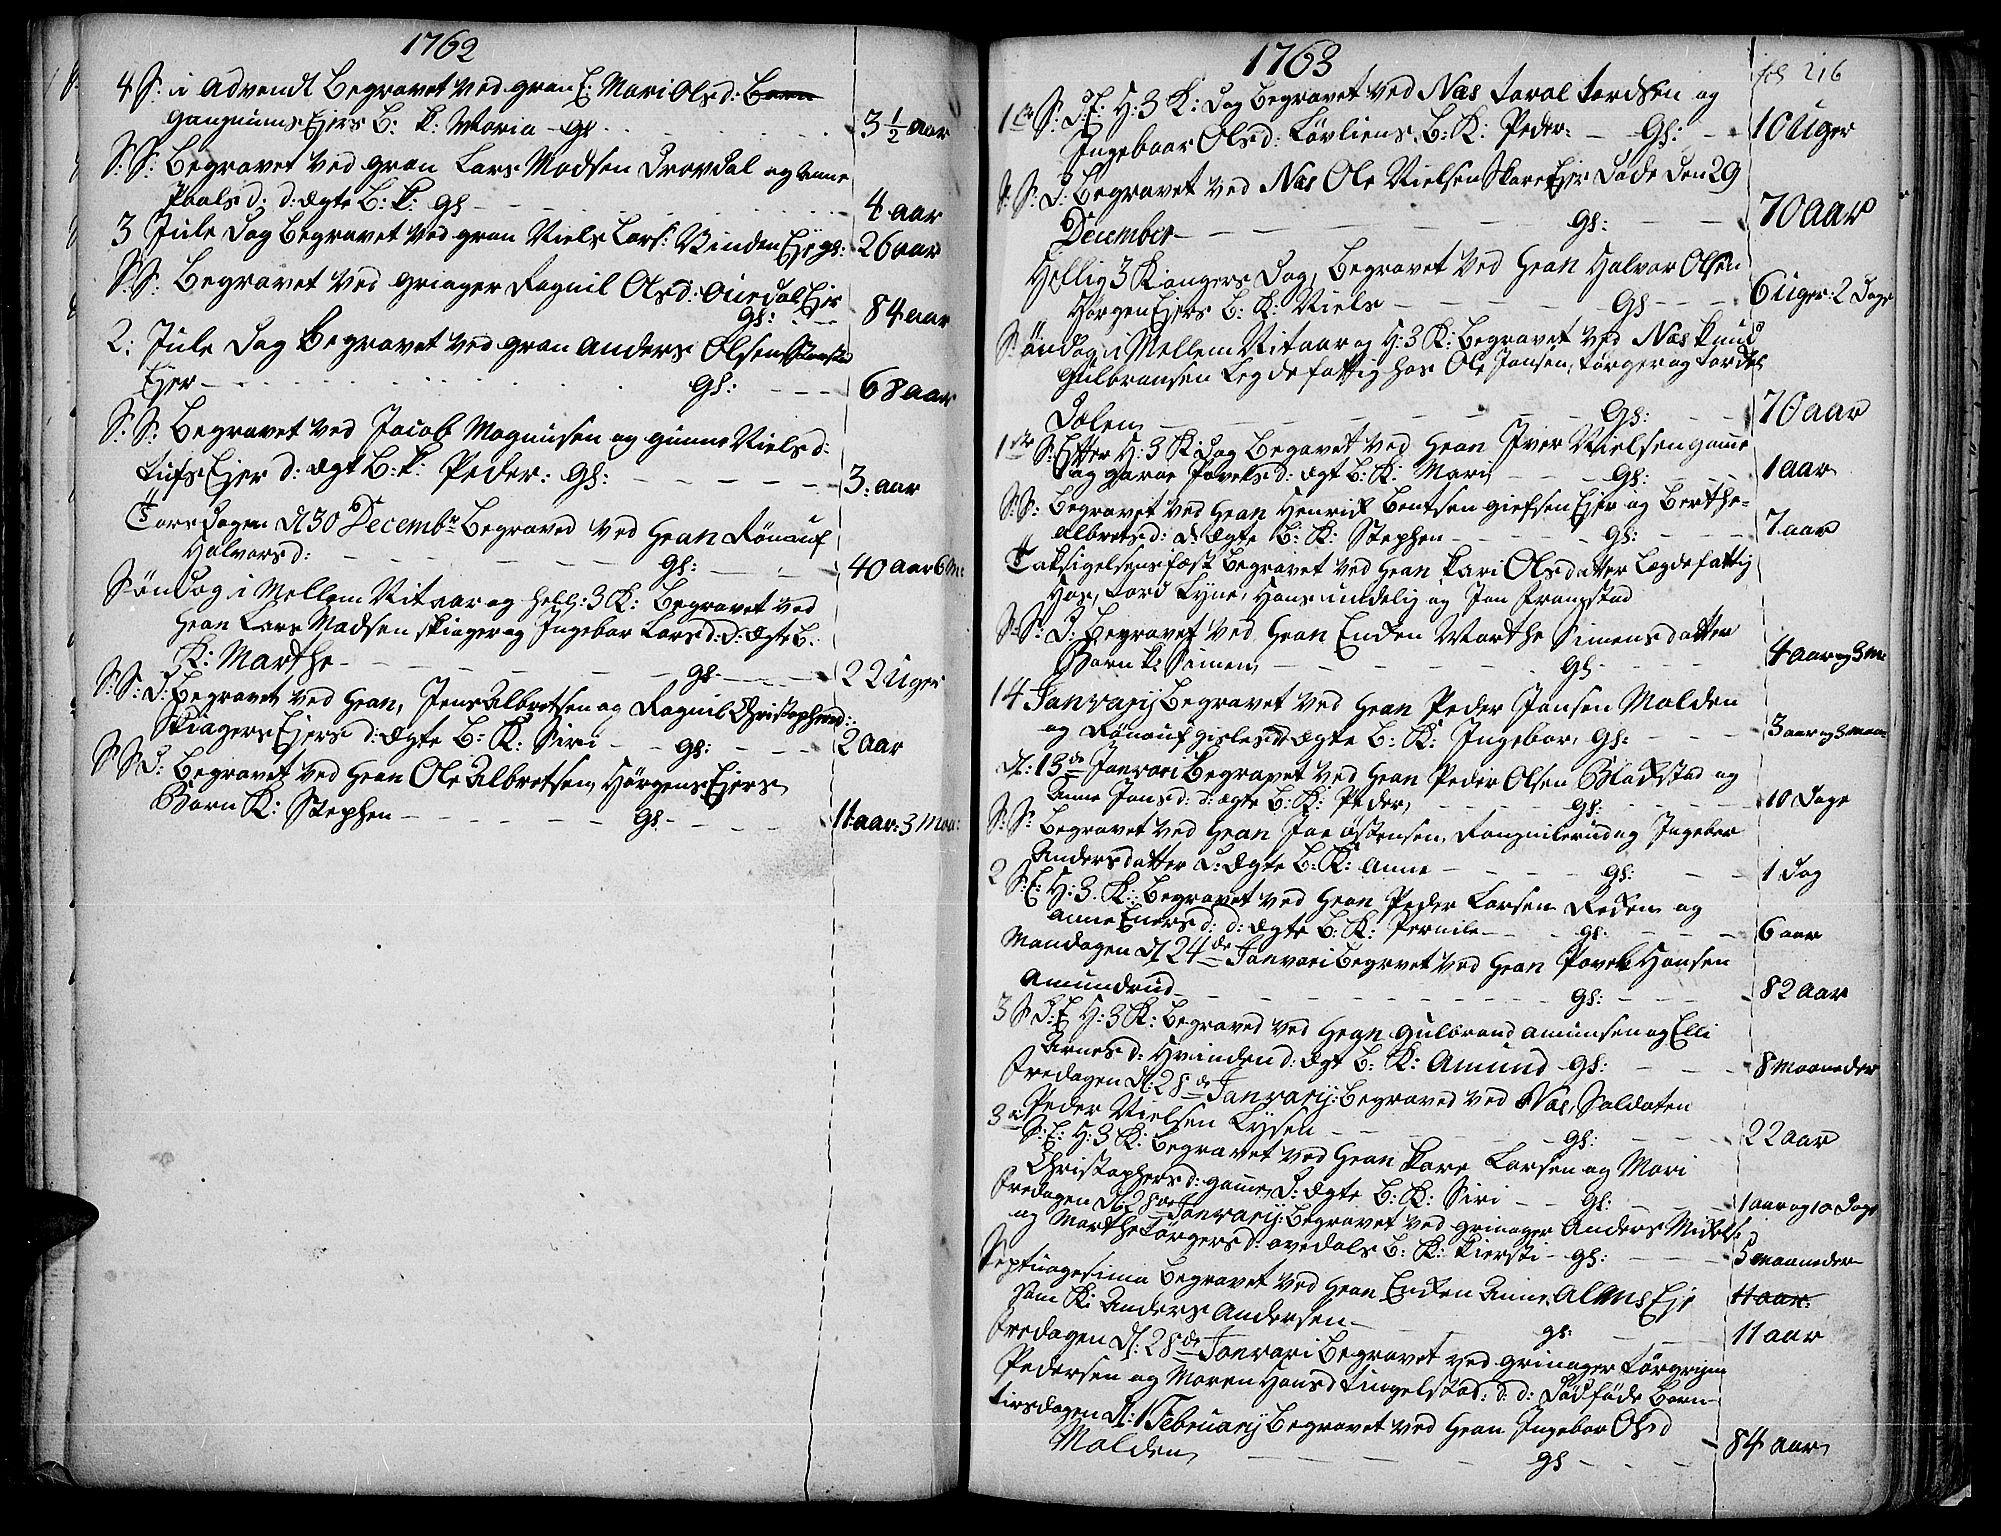 SAH, Gran prestekontor, Ministerialbok nr. 4, 1759-1775, s. 216